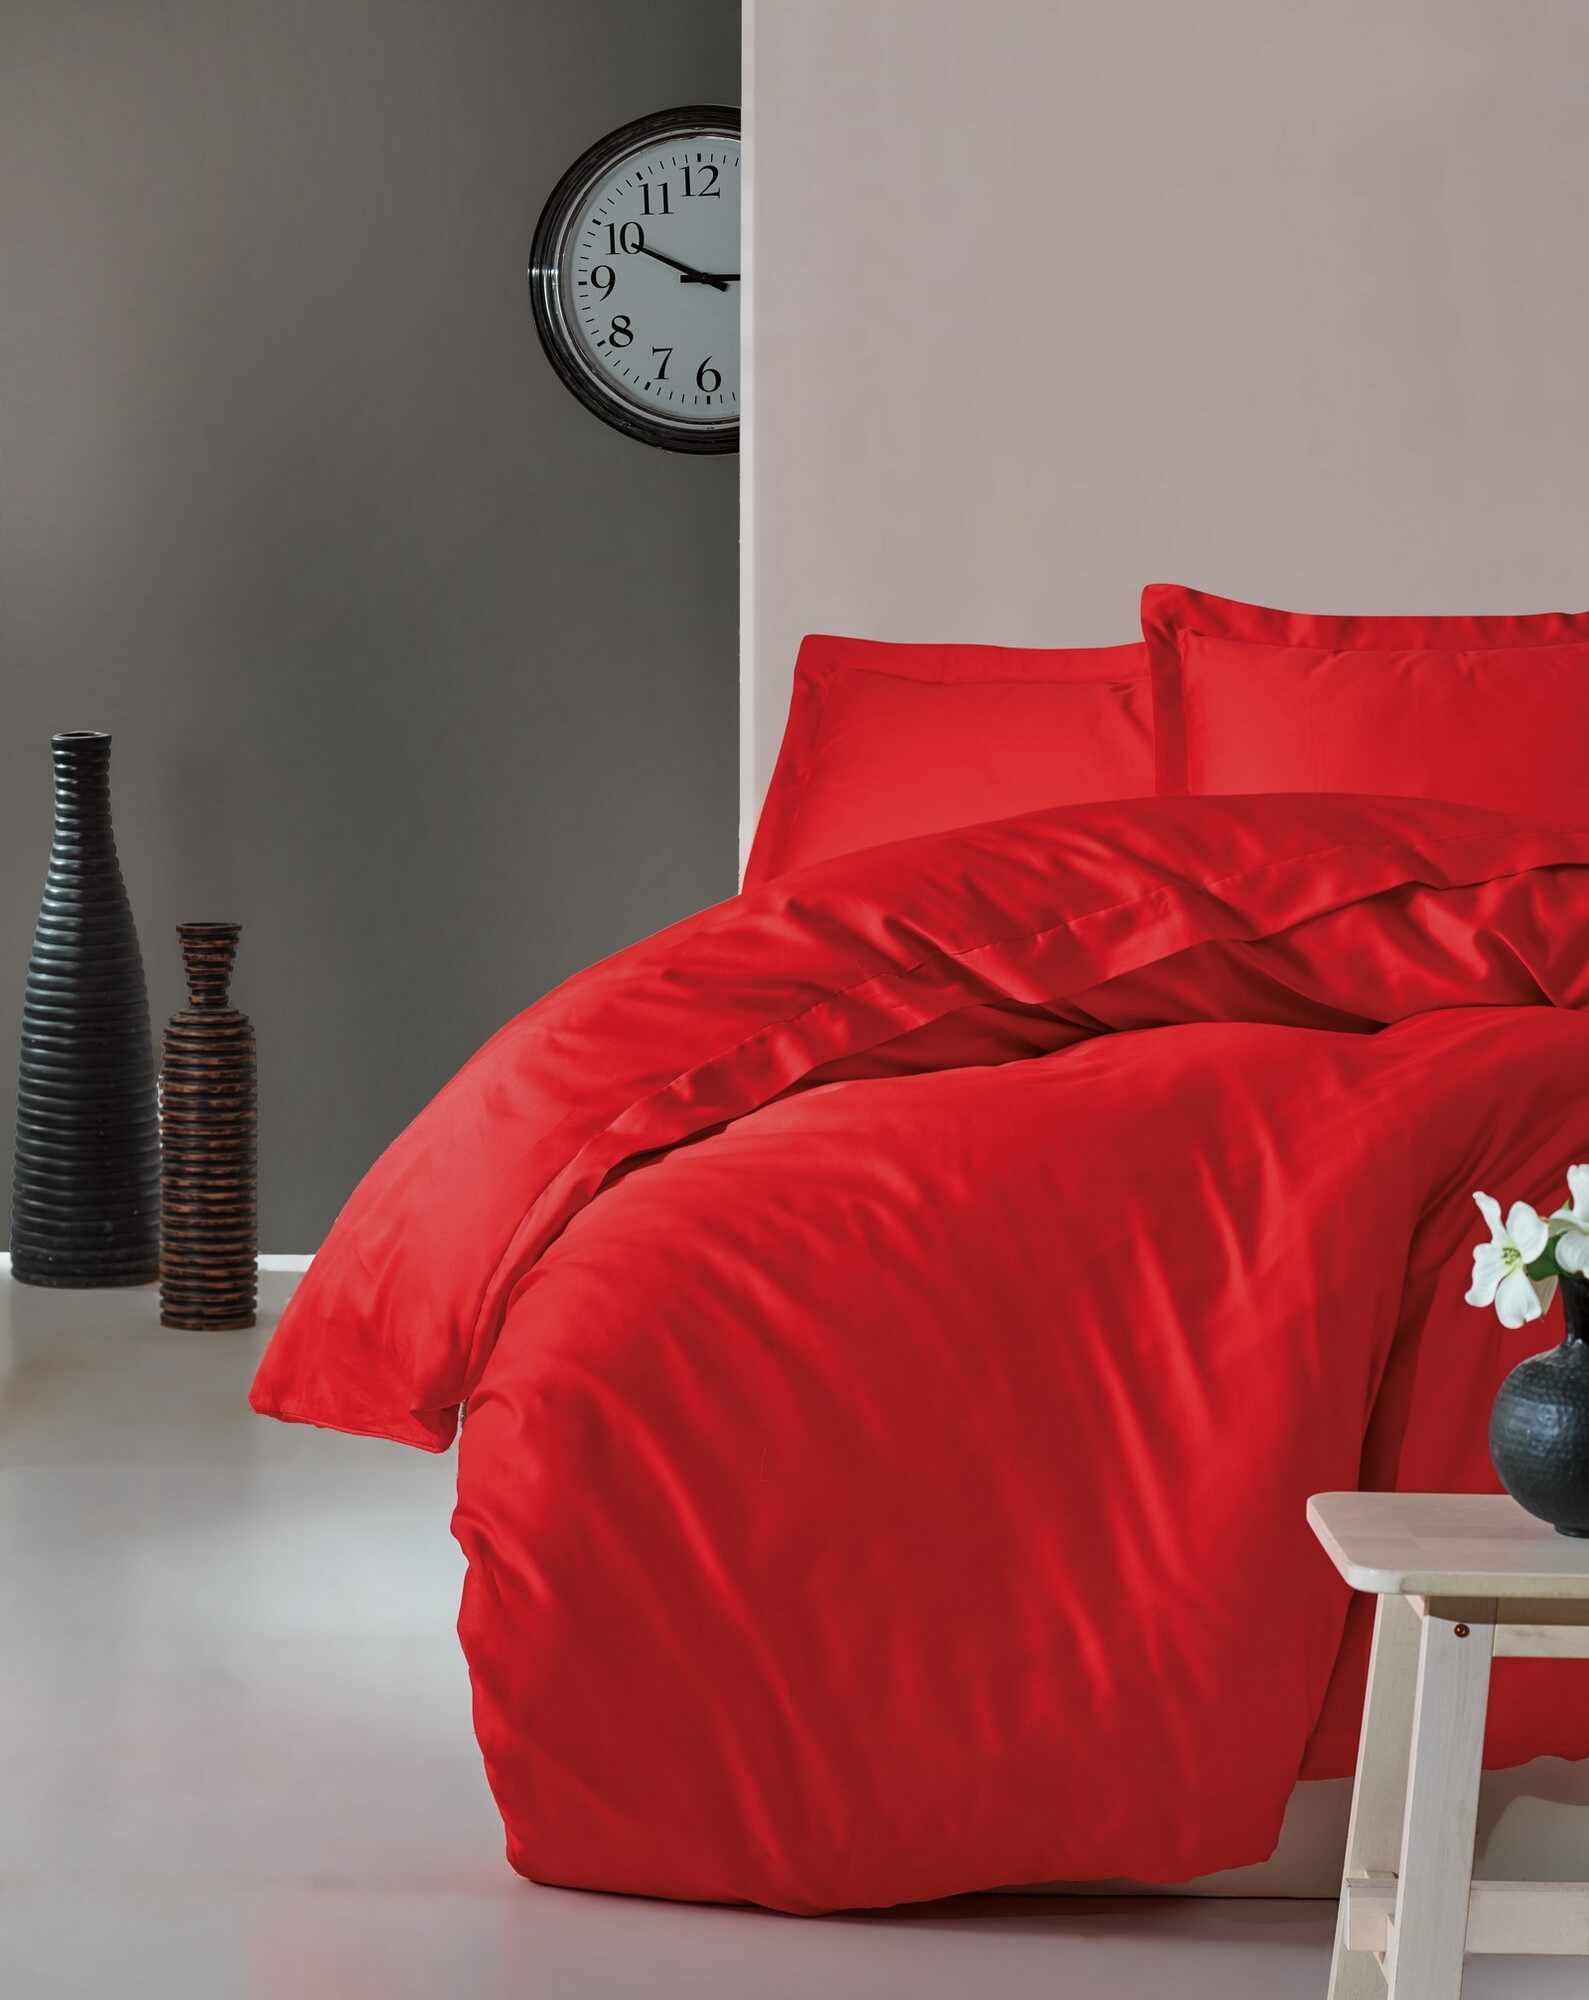 Lenjerie de pat din bumbac Satinat Premium Elegant Rosu, 200 x 220 cm la pret 329 lei